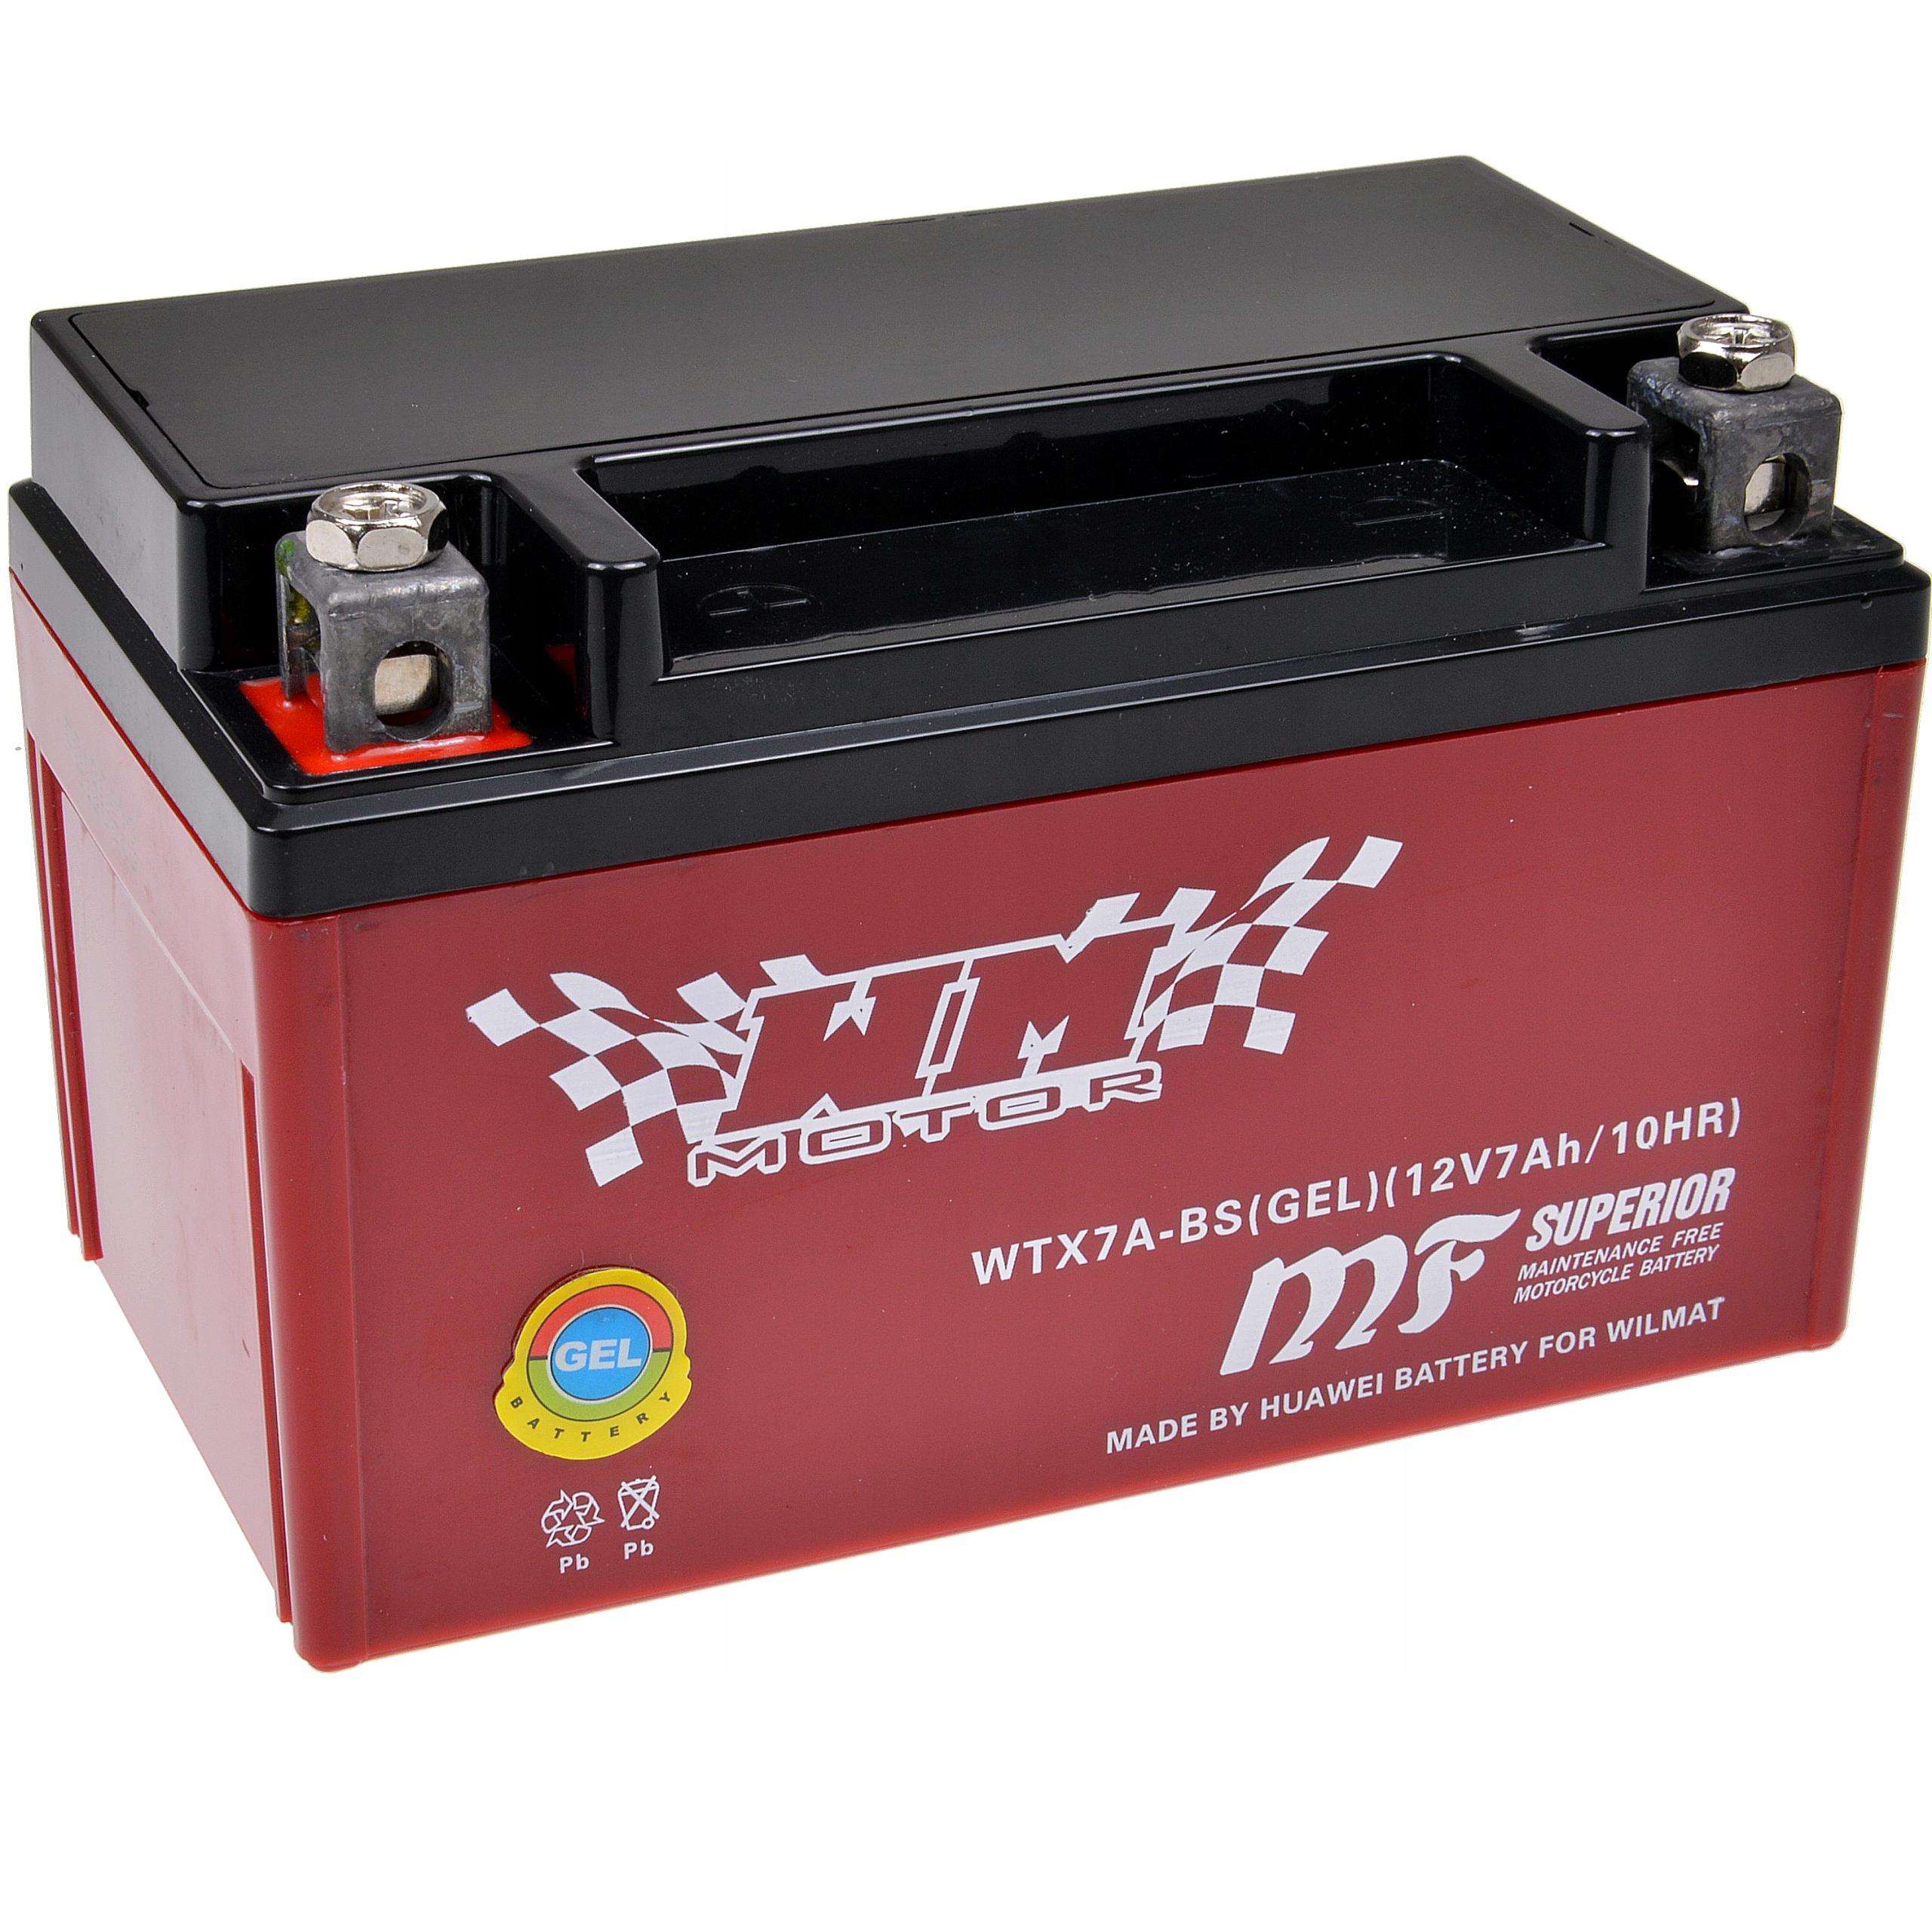 Akumulator Zelowy Ytx7a Bs 12v 7ah Quad Atv 125 15 Lublin Allegro Pl